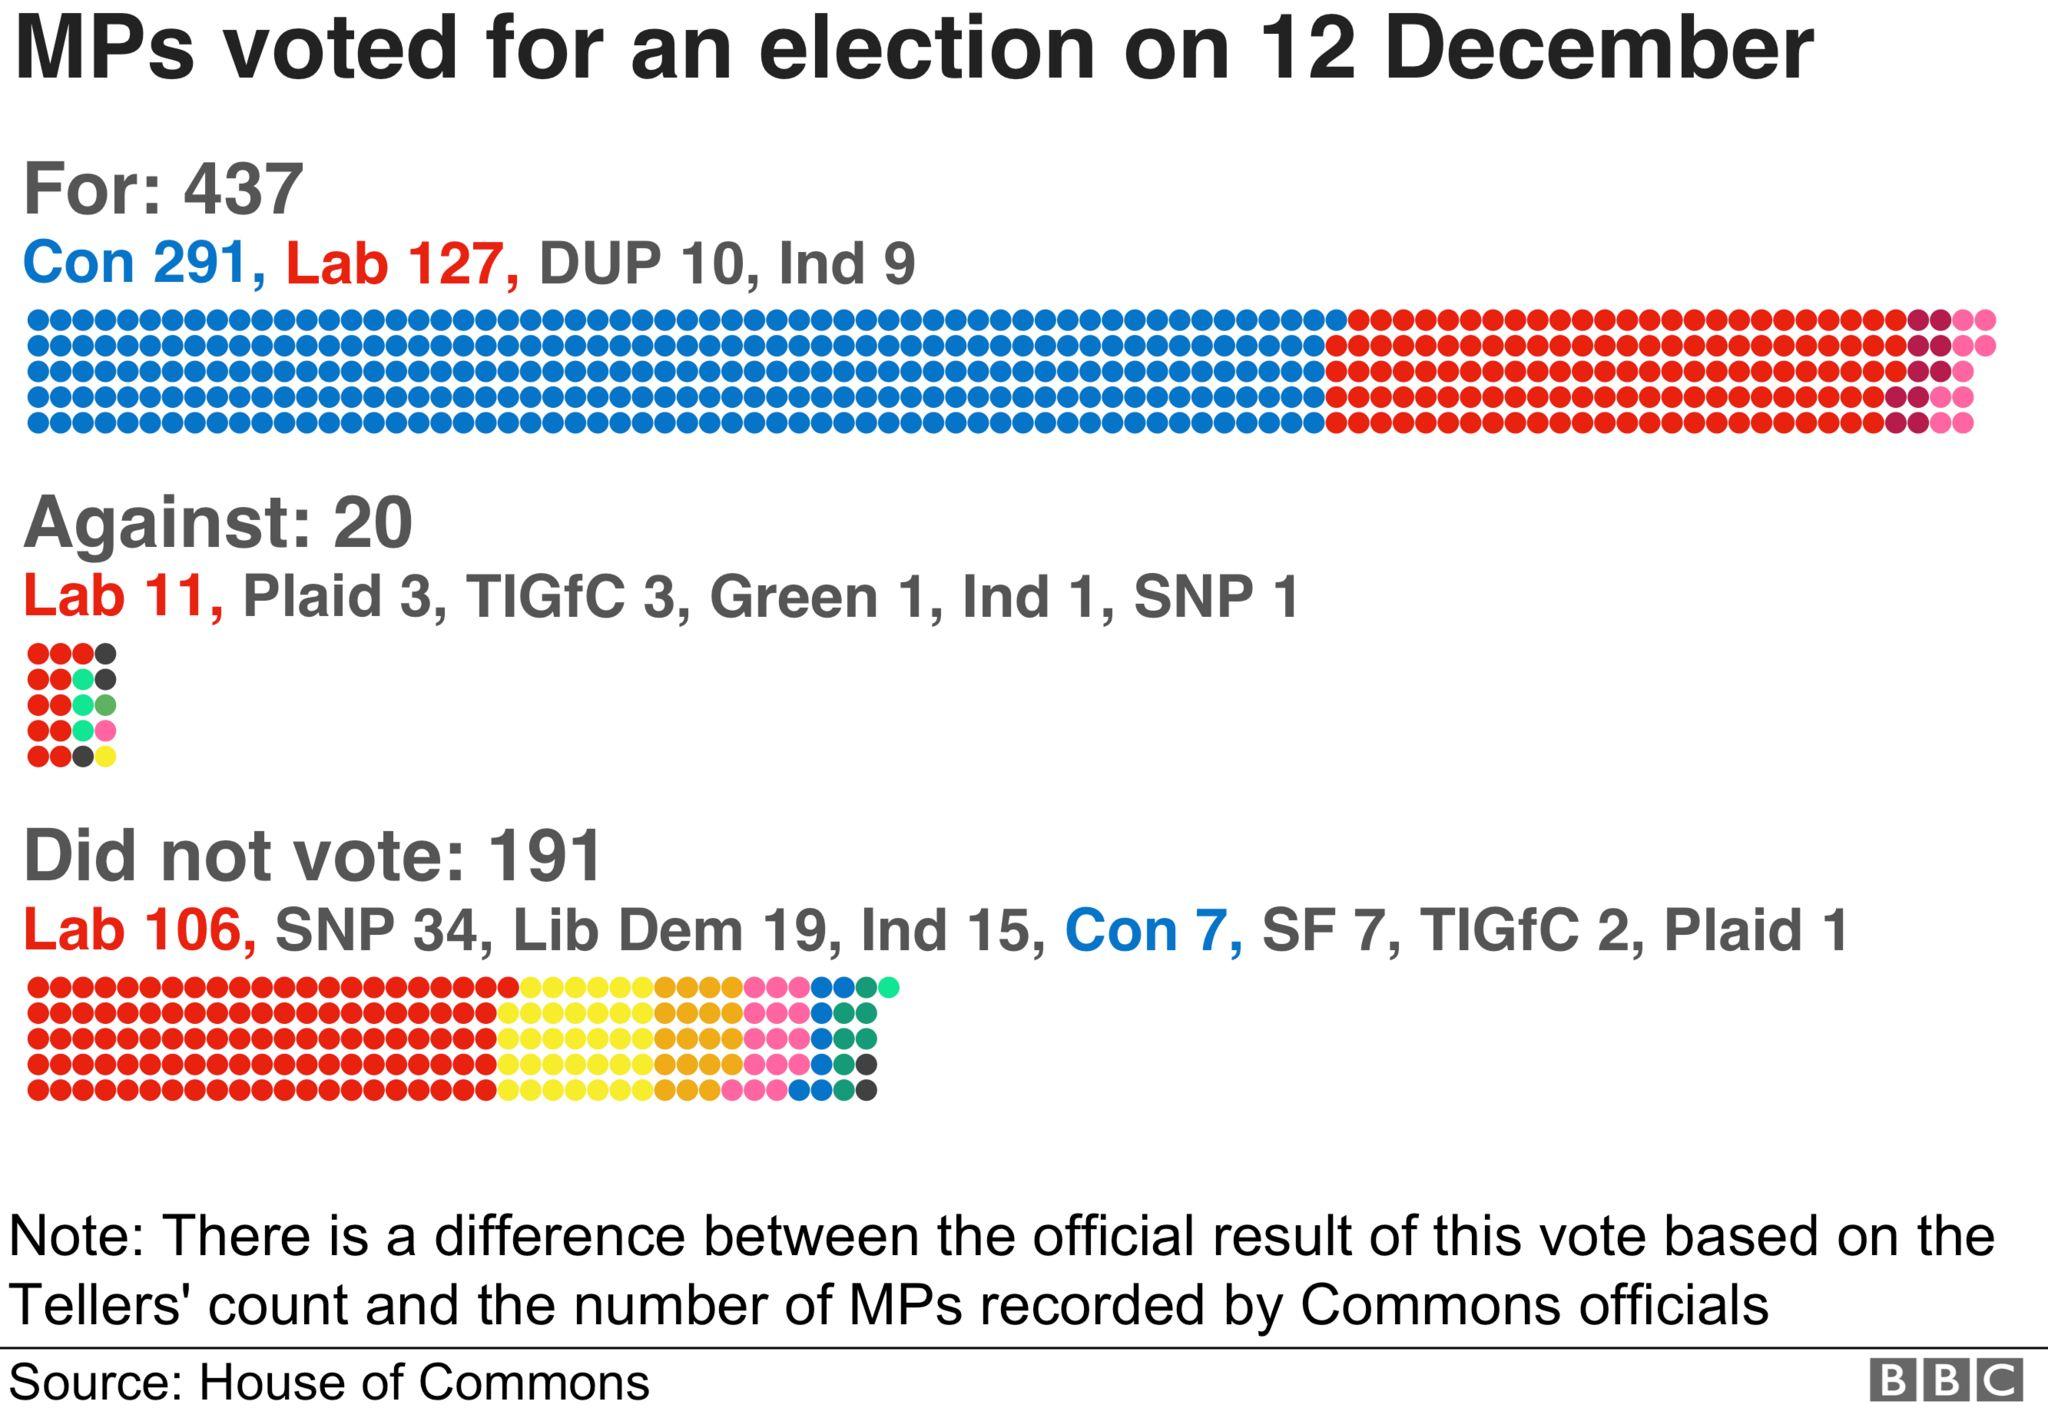 Vote breakdown by party